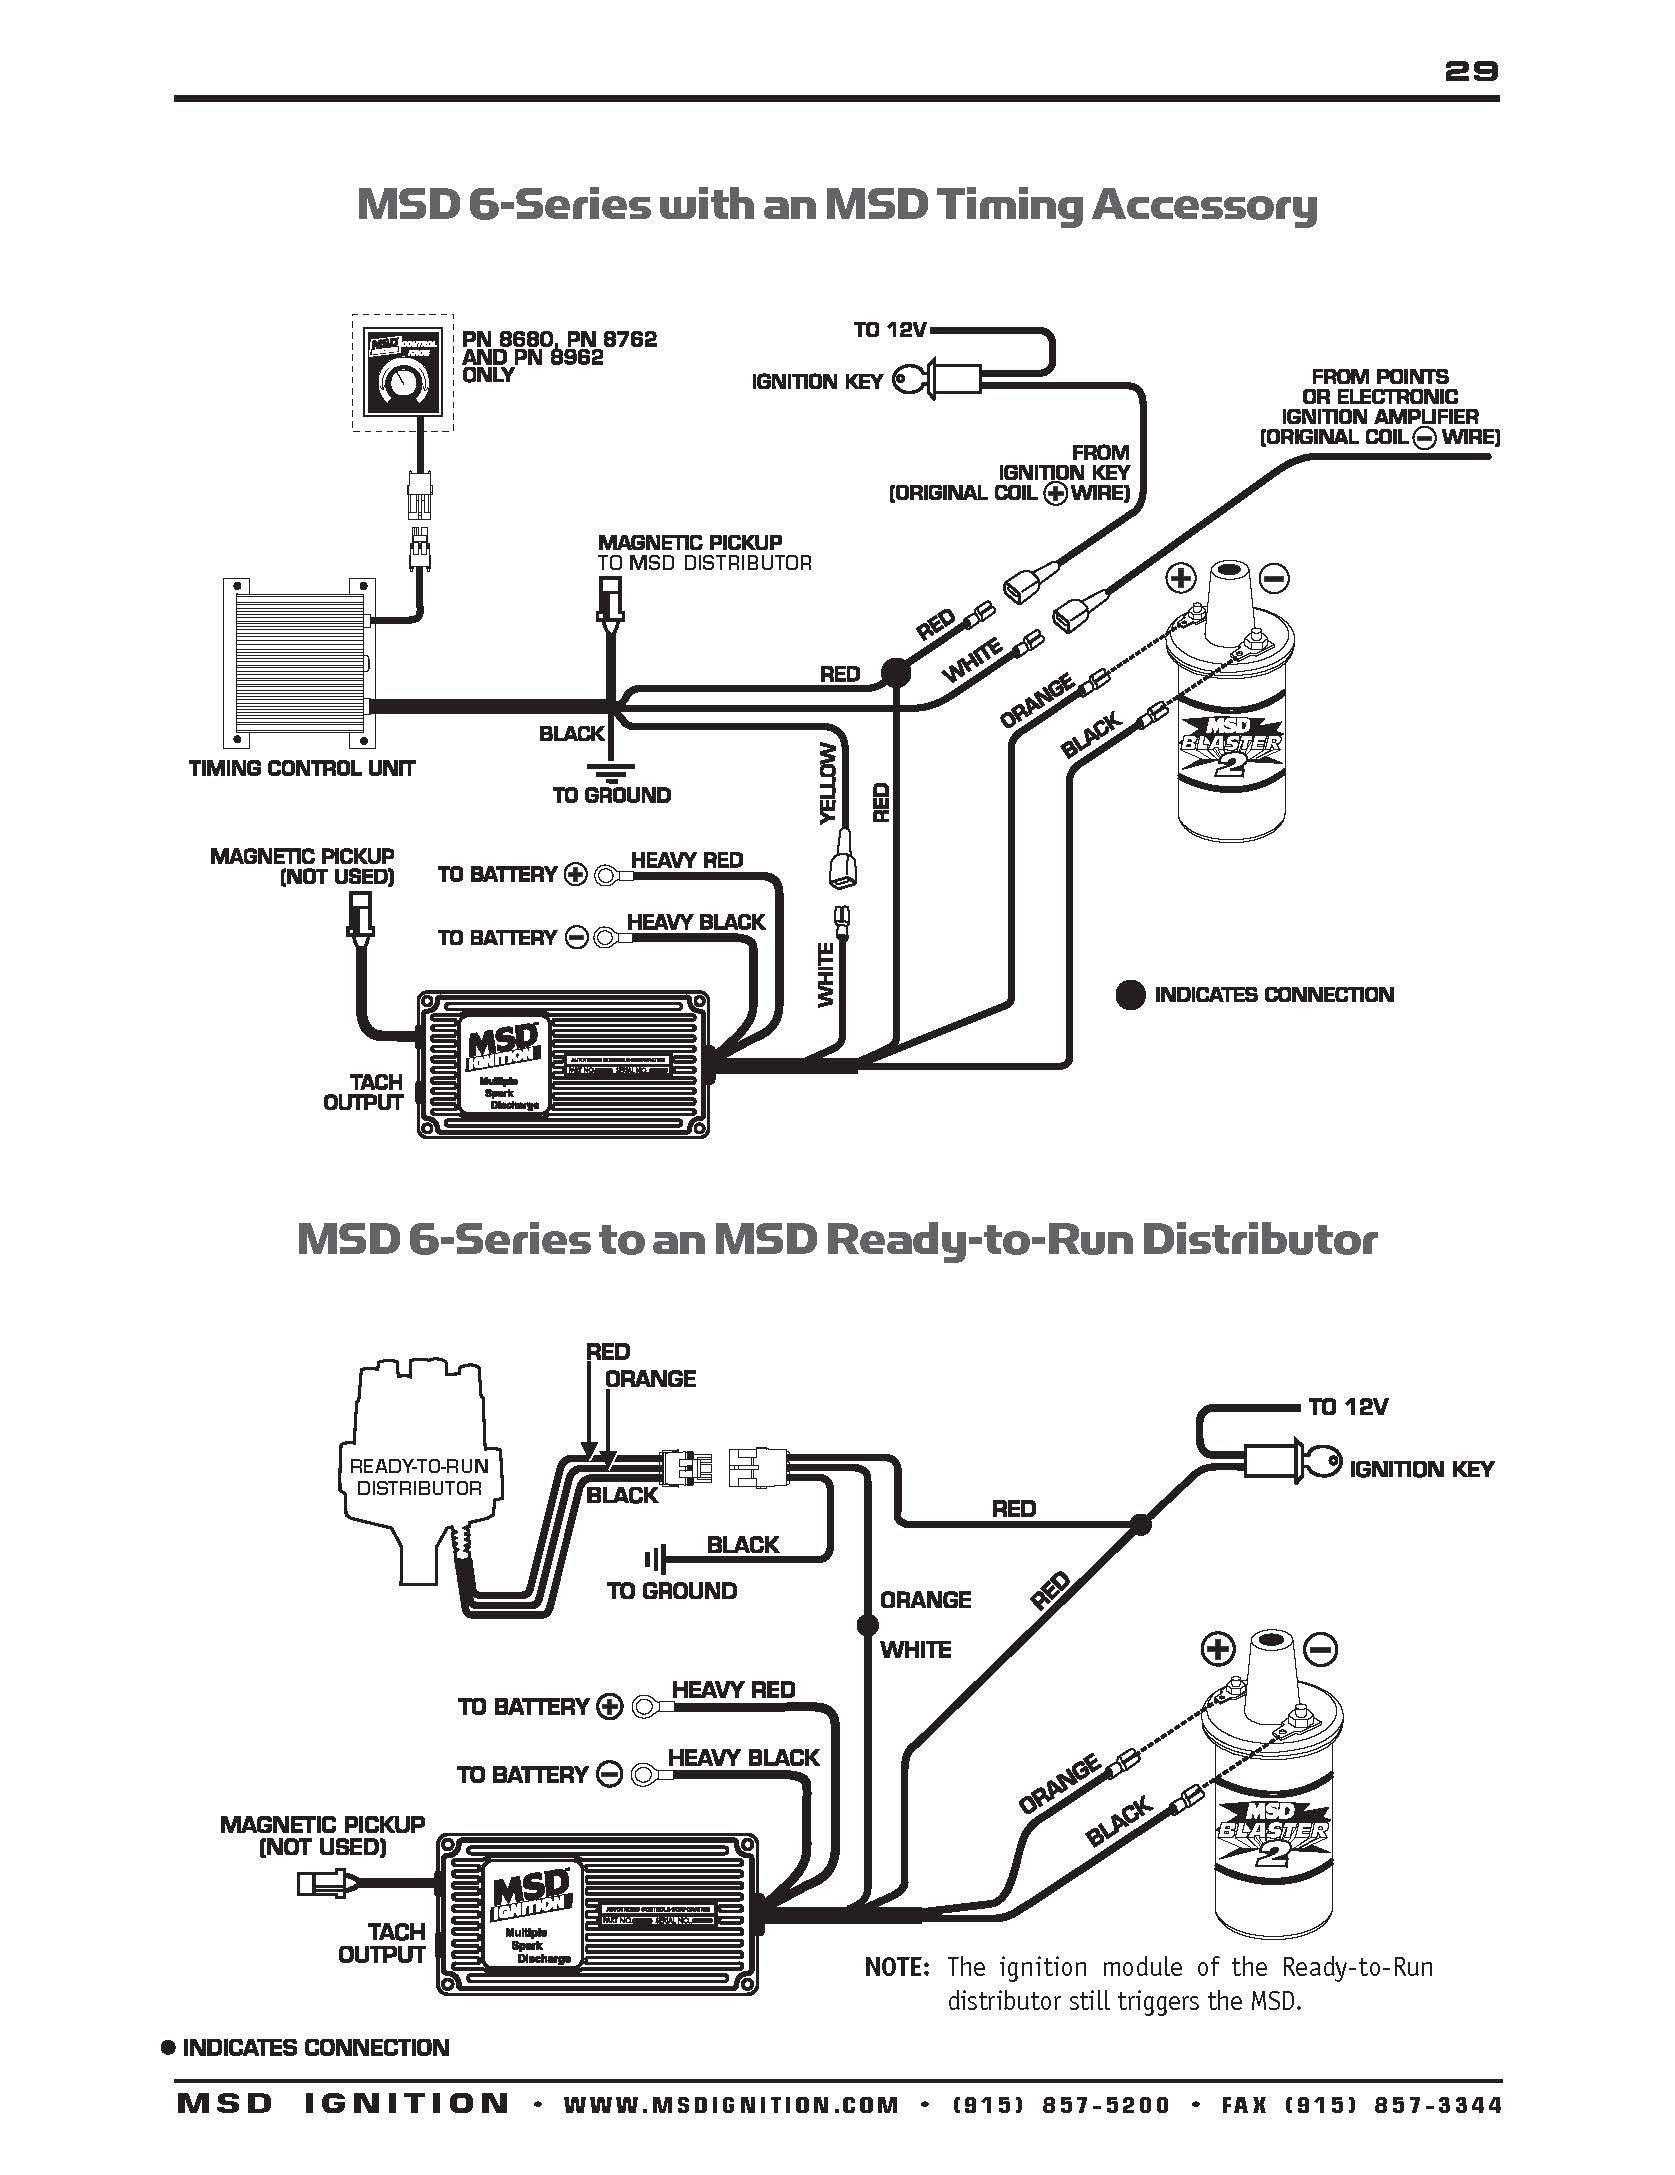 Ford 460 Firing Order Diagram 1973 Best Of In 2020 | Diagram